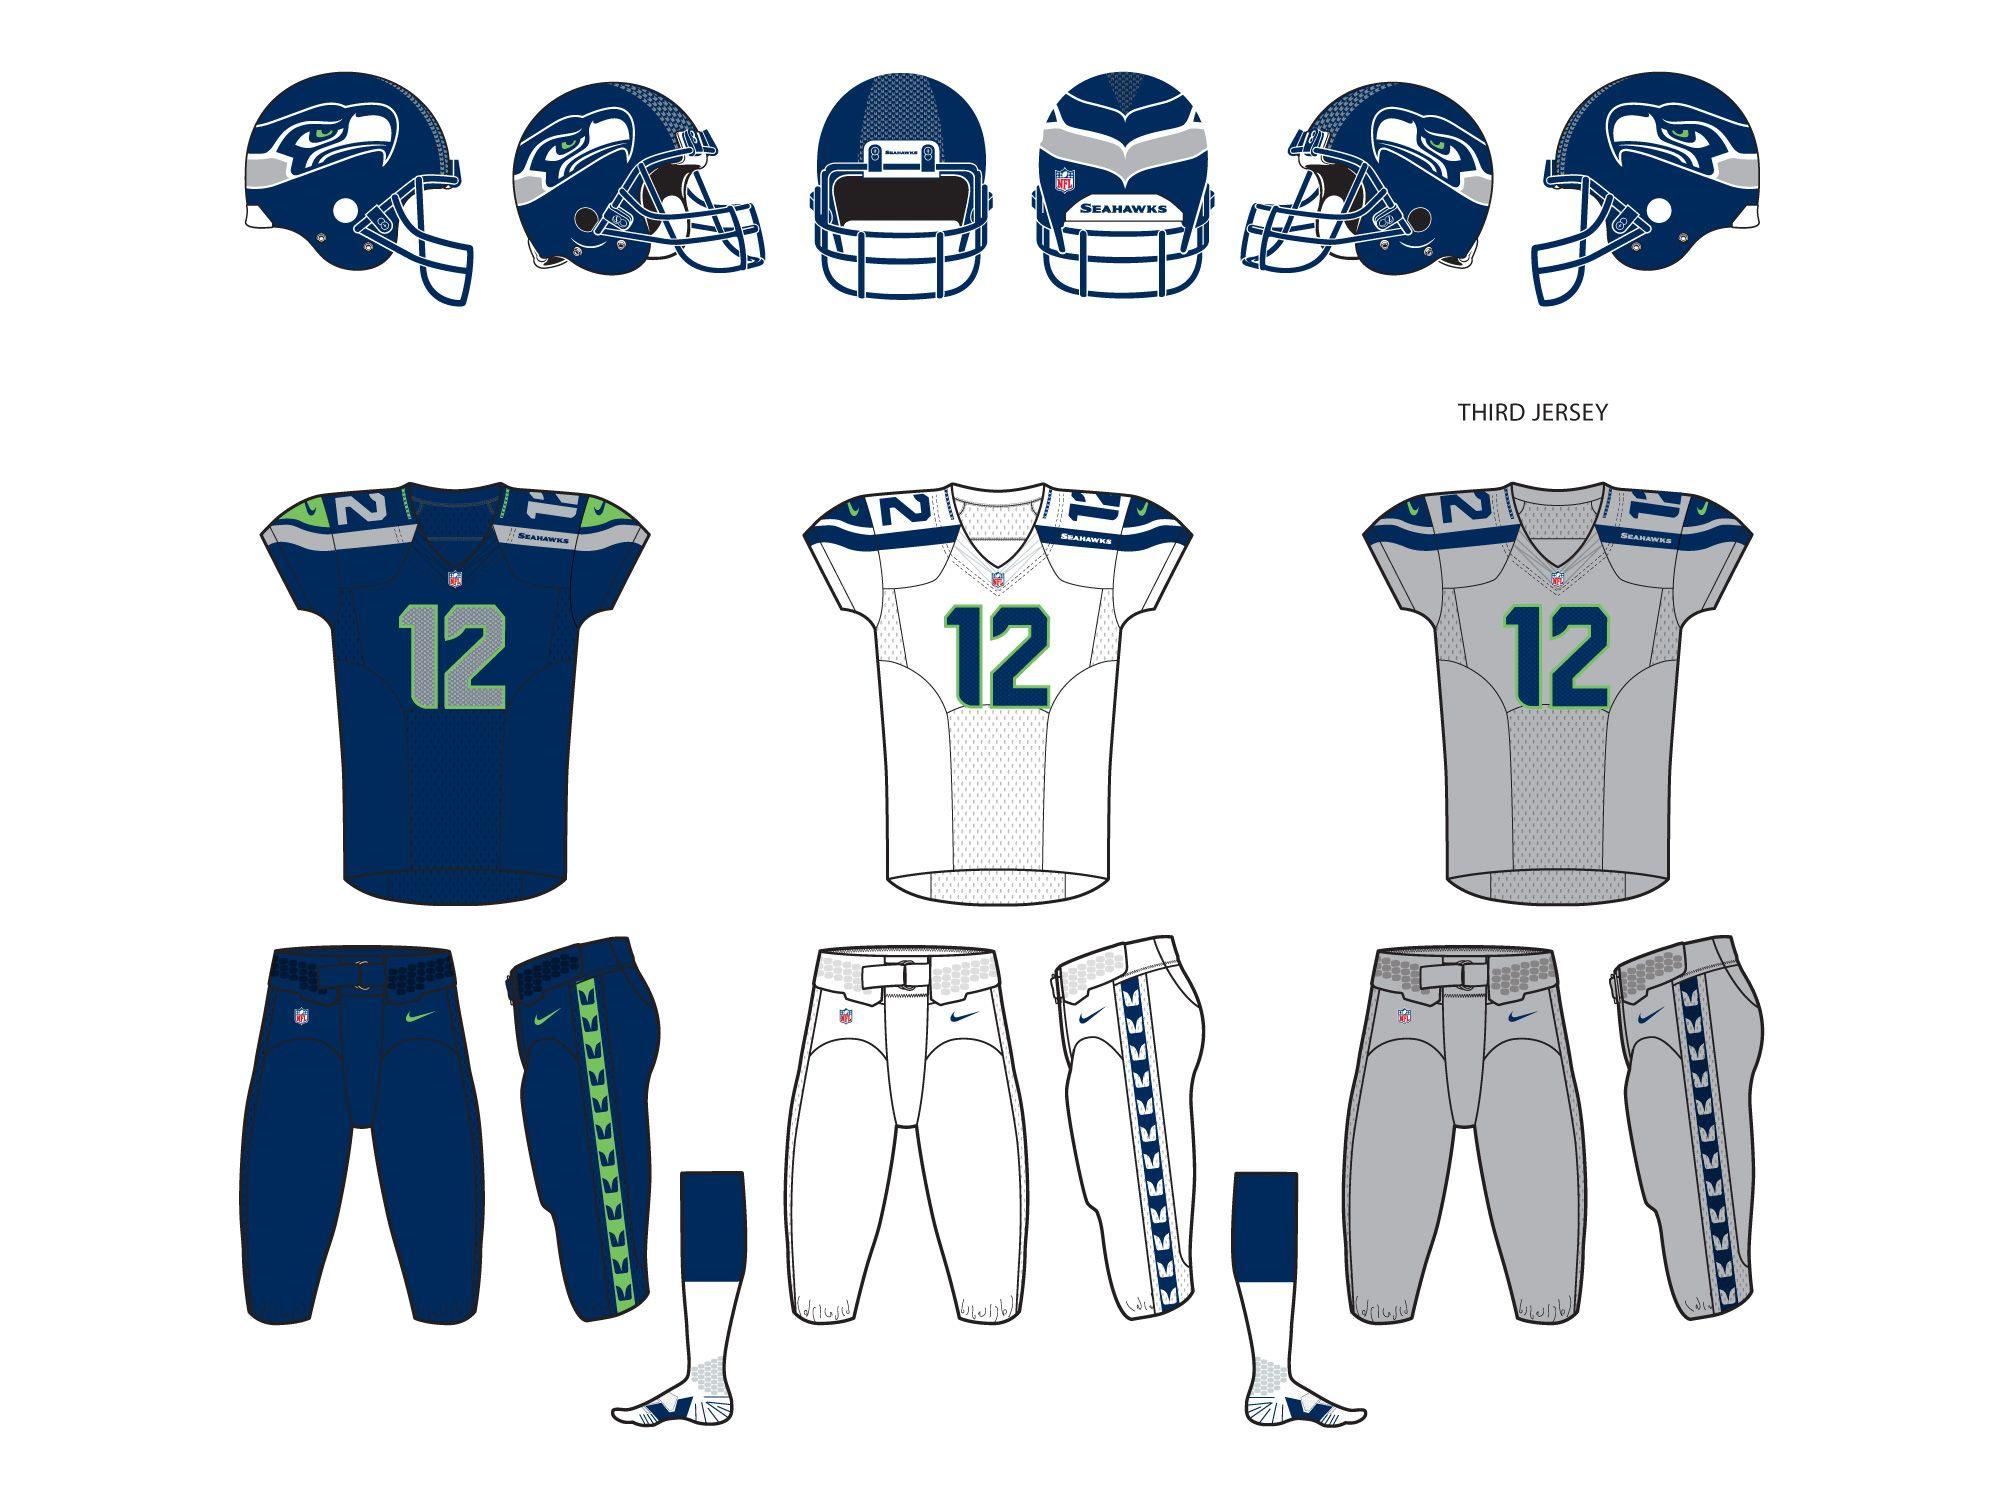 Seattle Seahawks 2012 Helmet and Uniforms. Sports